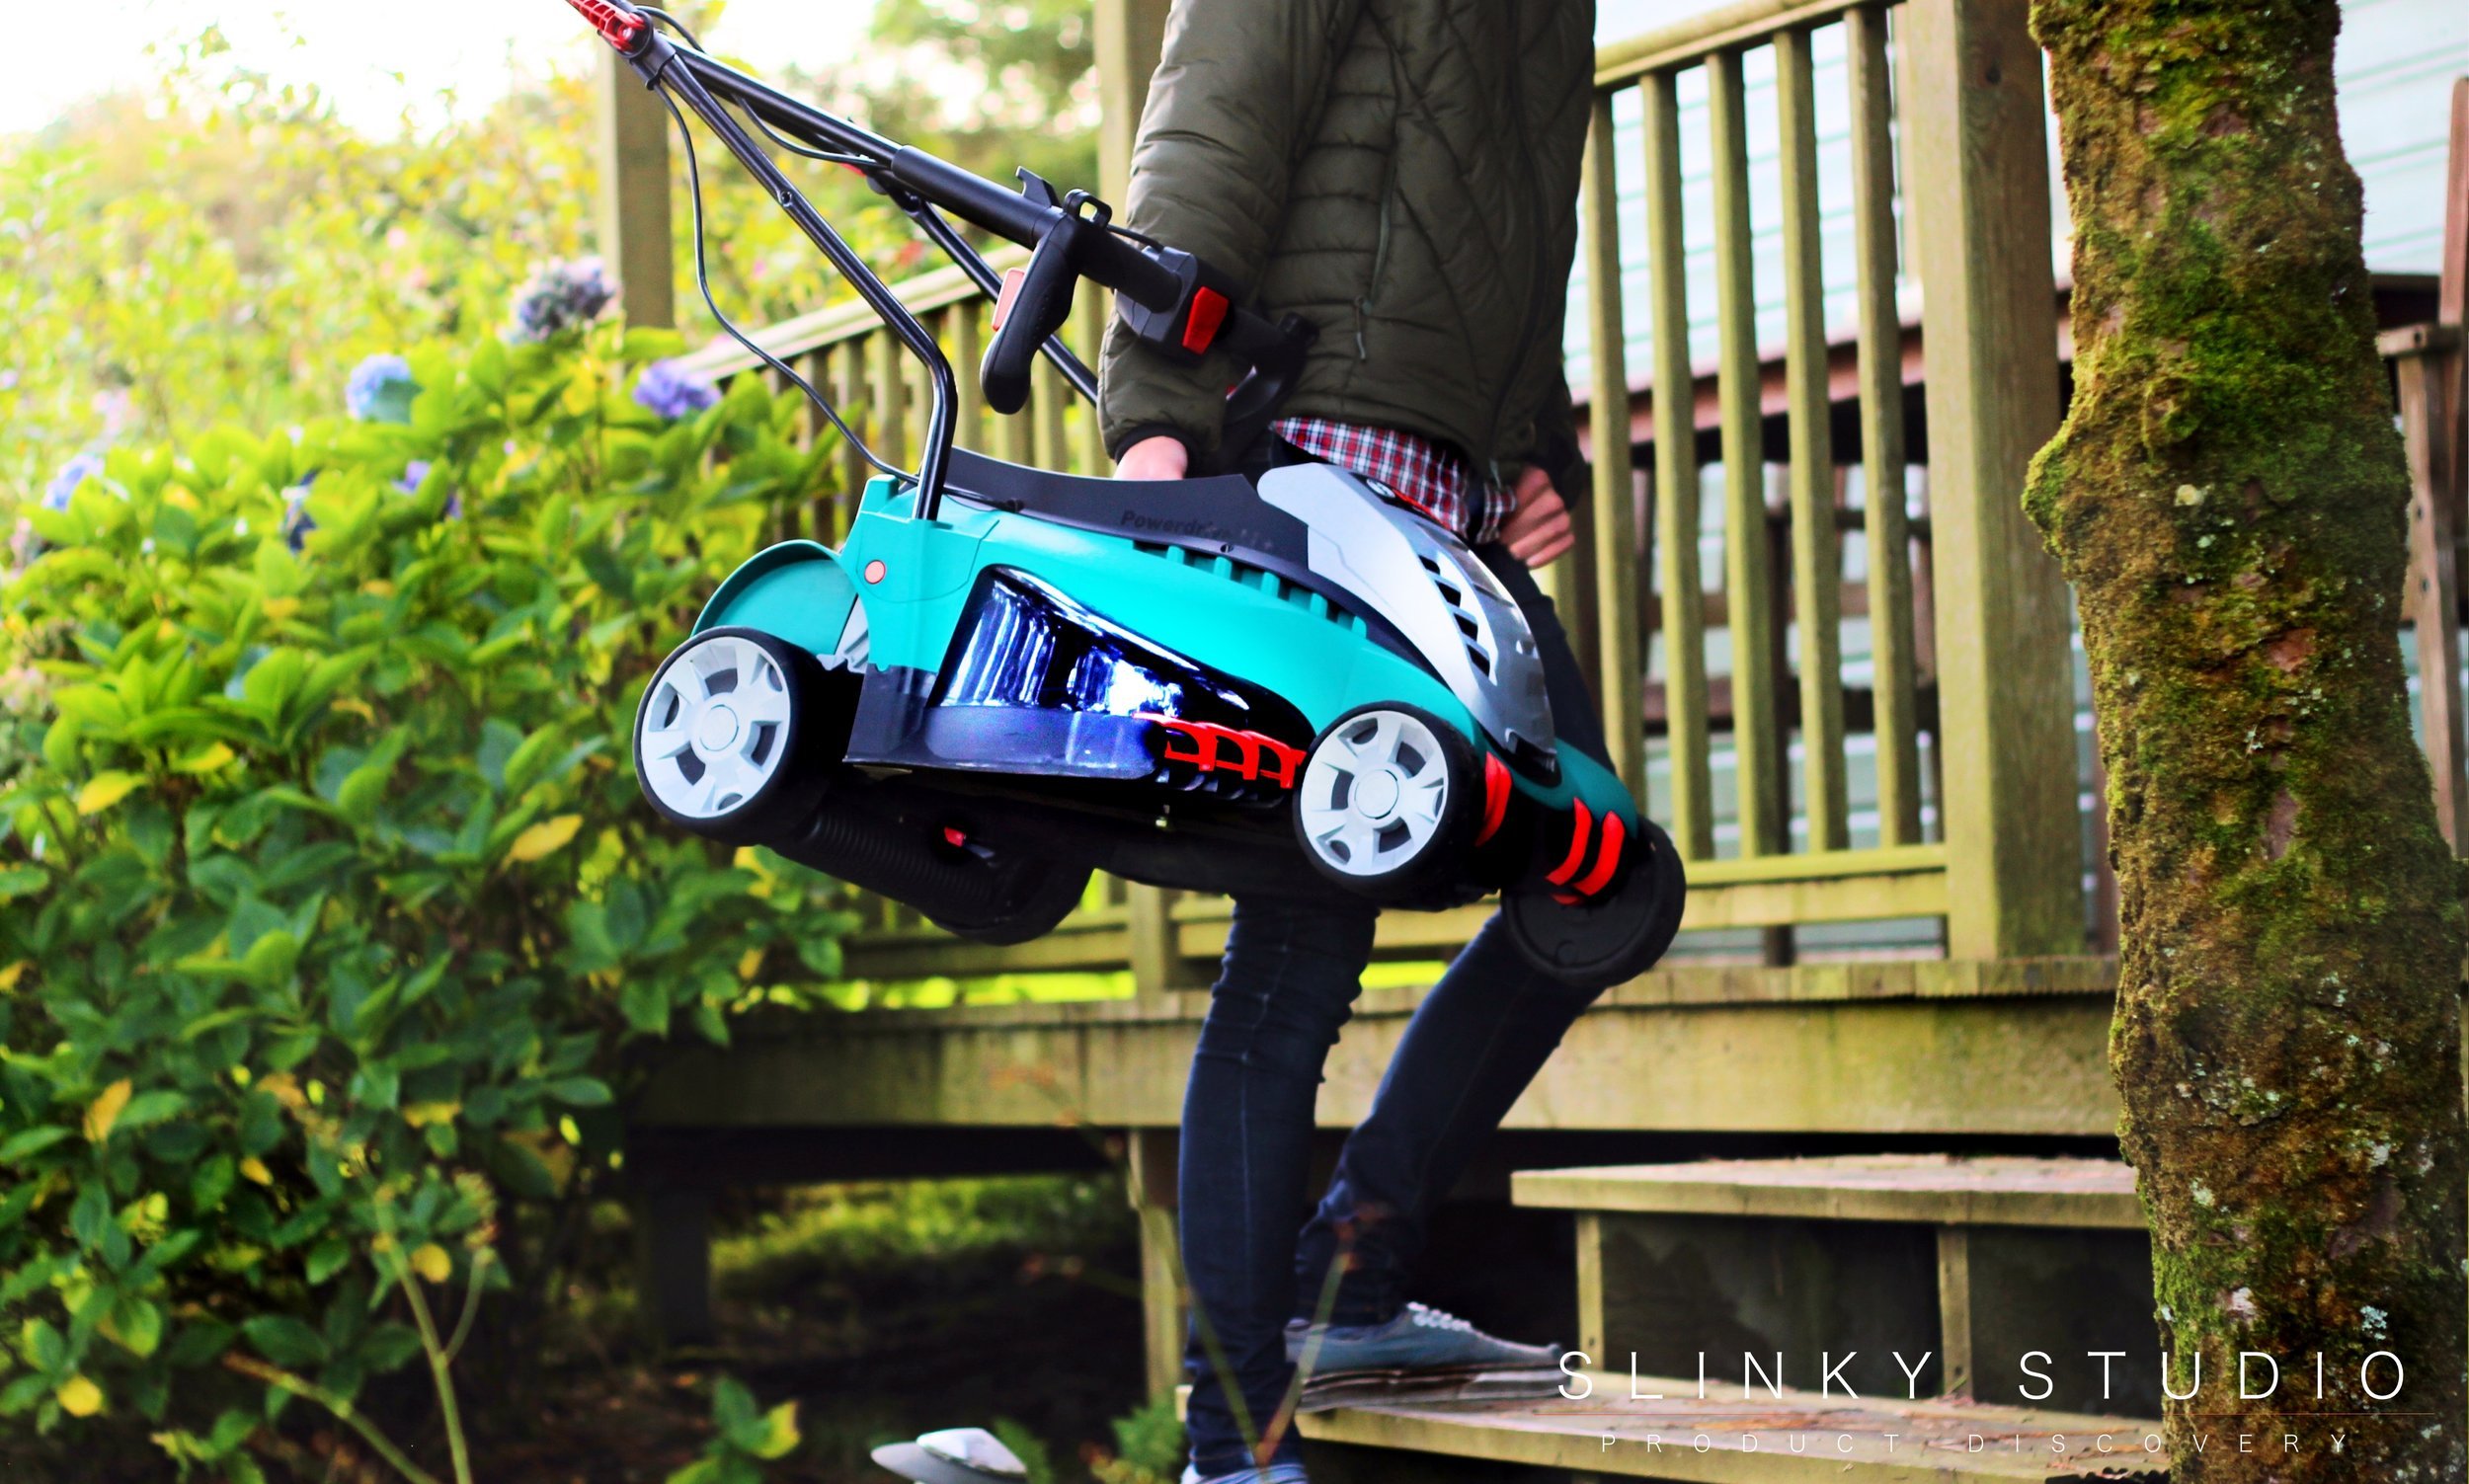 Bosch Rotak 43 LI Ergoflex Cordless Lawnmower Carried Upstairs.jpg